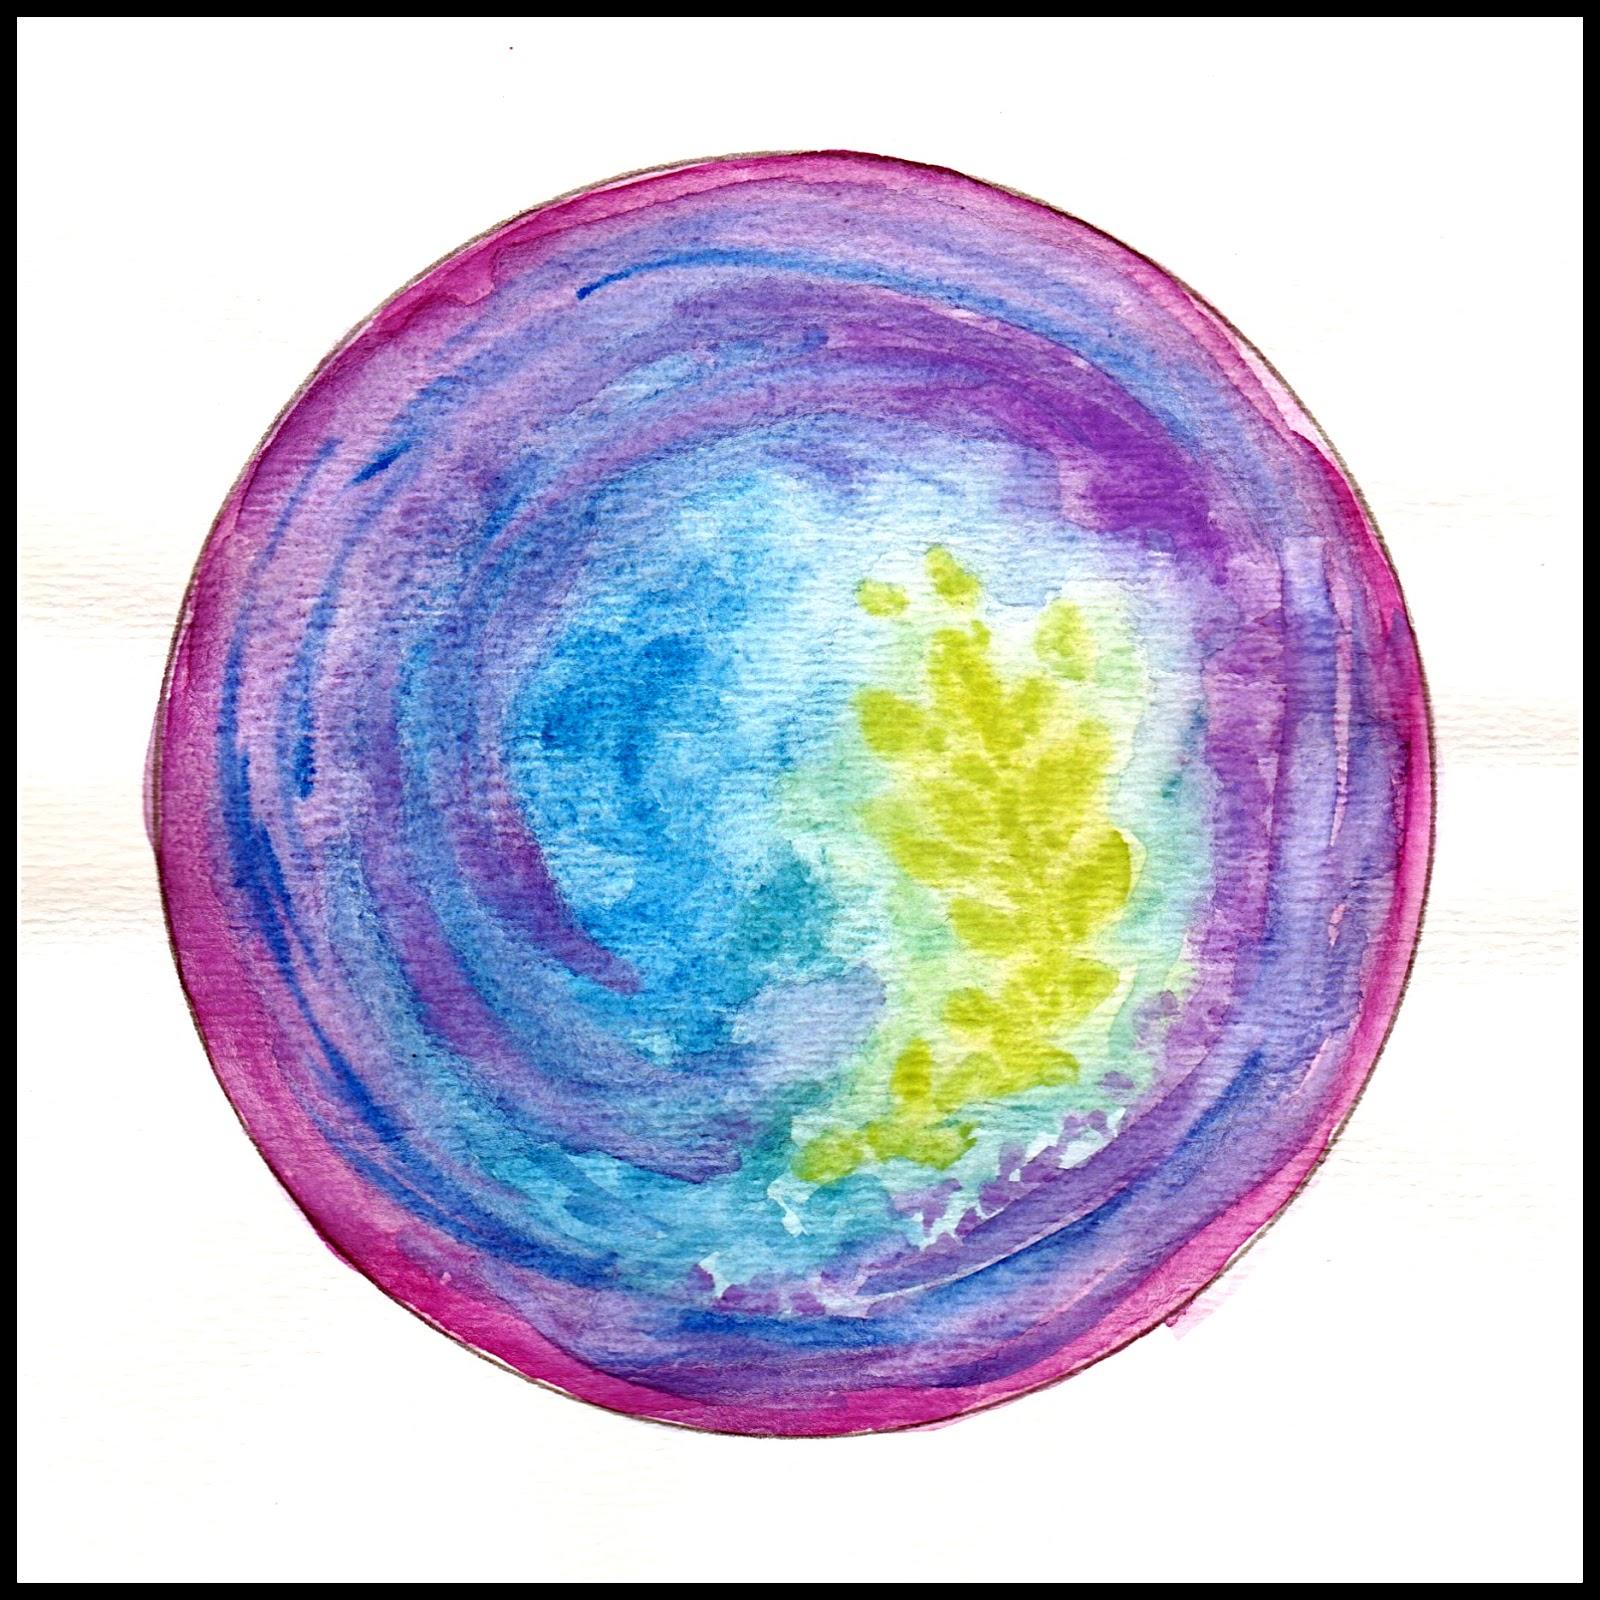 Mandalas and Mindful Studio | Creativity in Therapy | Carolyn Mehlomakulu